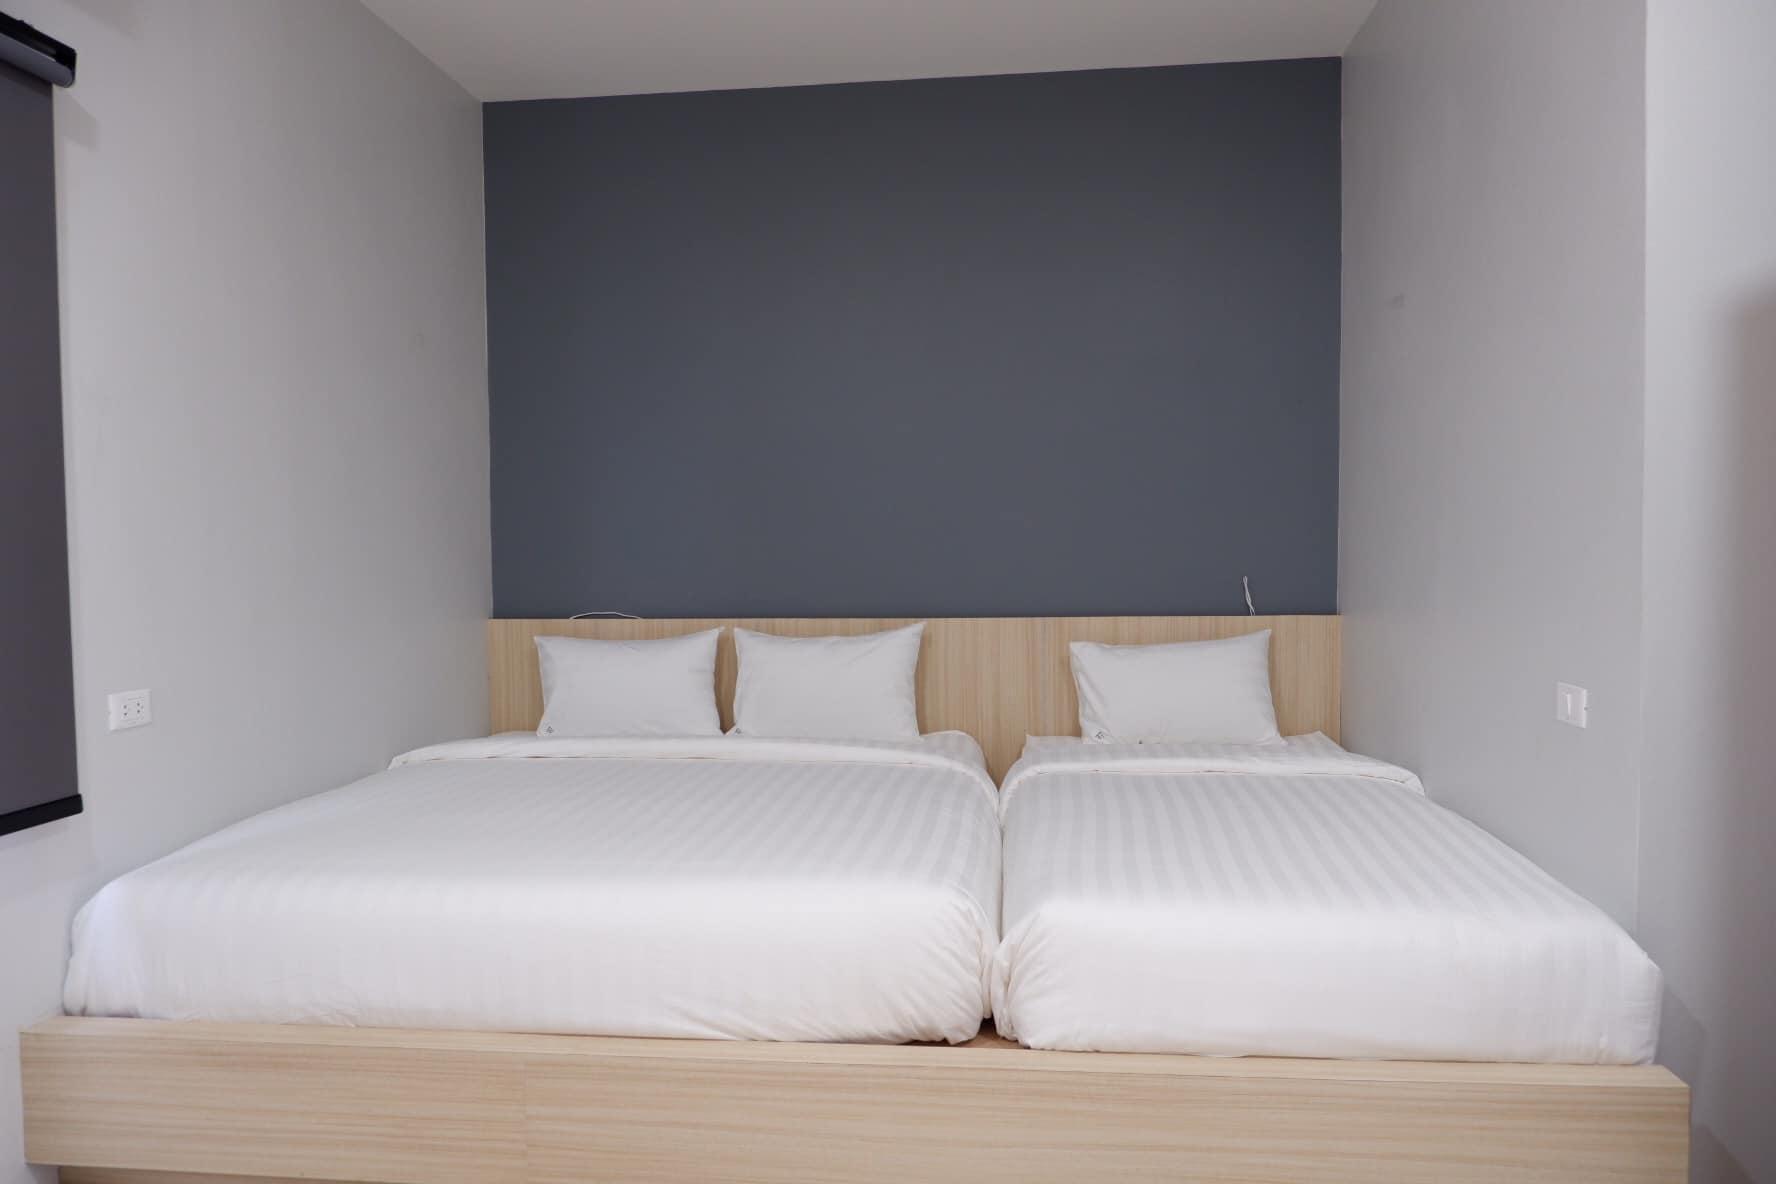 See Chan Pool Villa บ้านเดี่ยว 4 ห้องนอน 4 ห้องน้ำส่วนตัว ขนาด 70 ตร.ม. – อำเภอเมือง